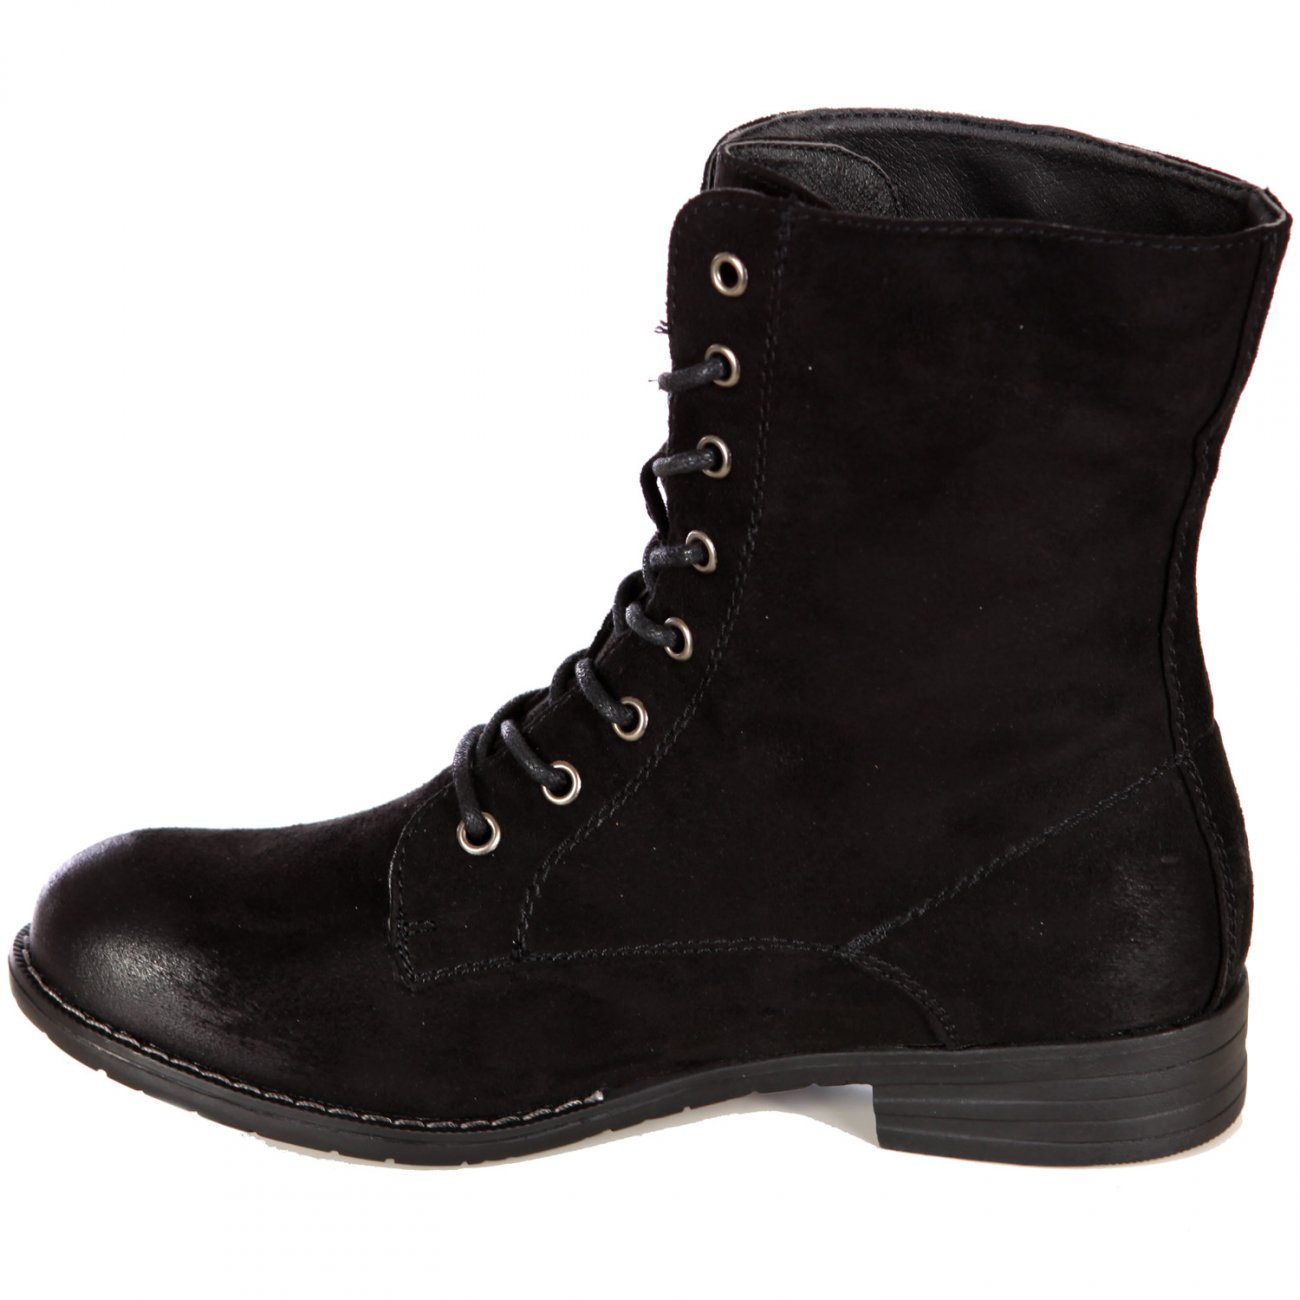 damen stiefeletten schn rer in 3 farben winter boots wildleder. Black Bedroom Furniture Sets. Home Design Ideas